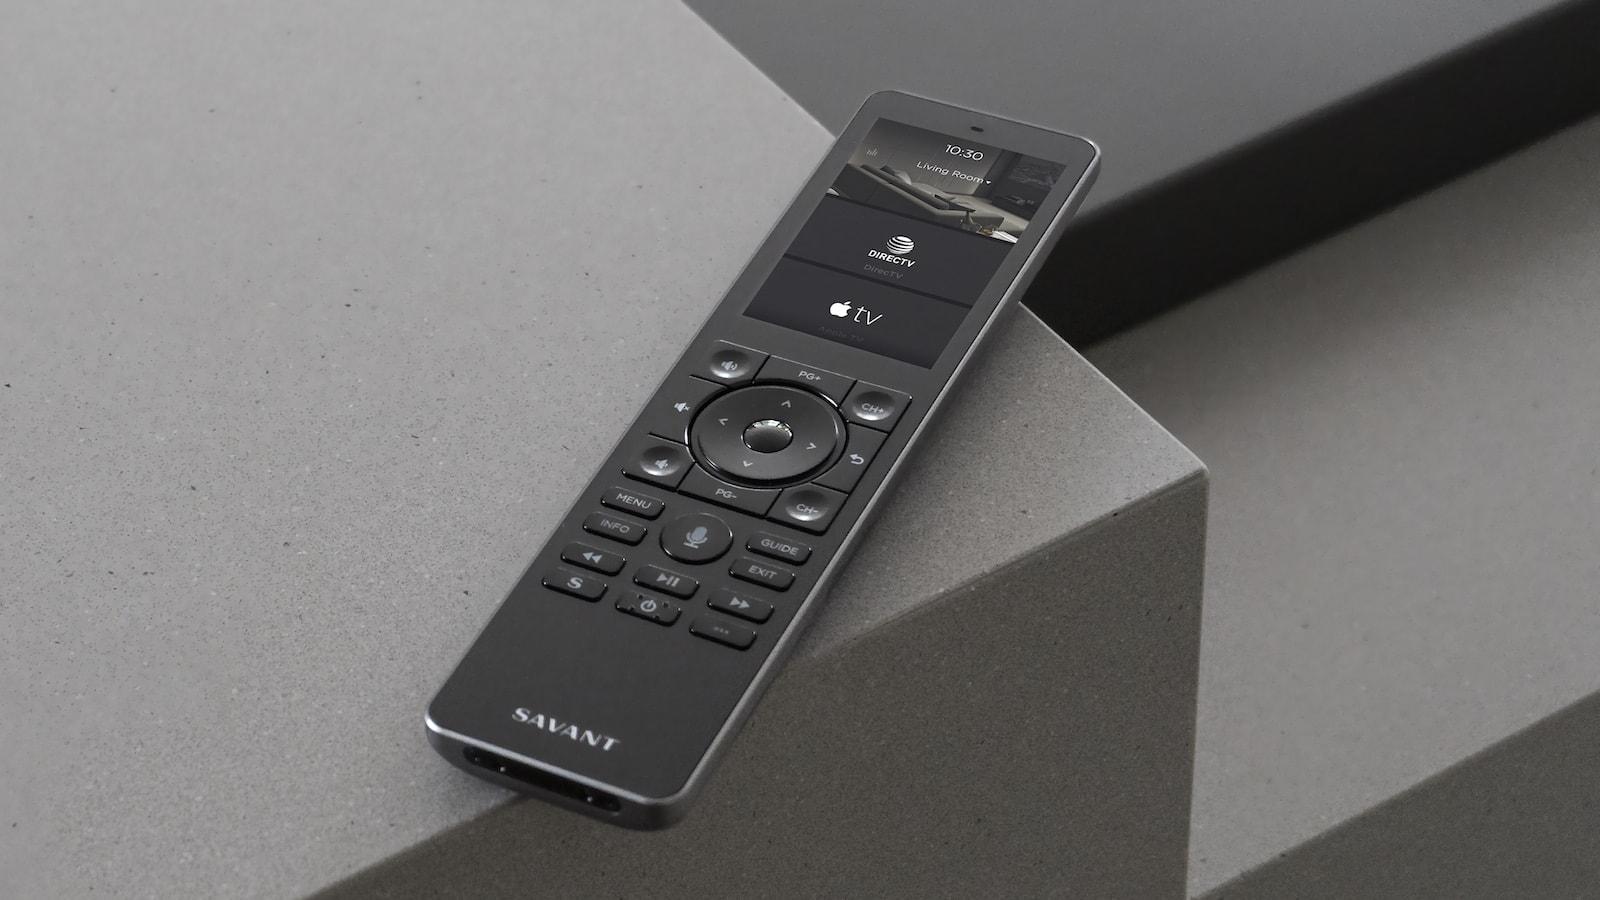 Savant Pro Remote X2 Personalized Controller